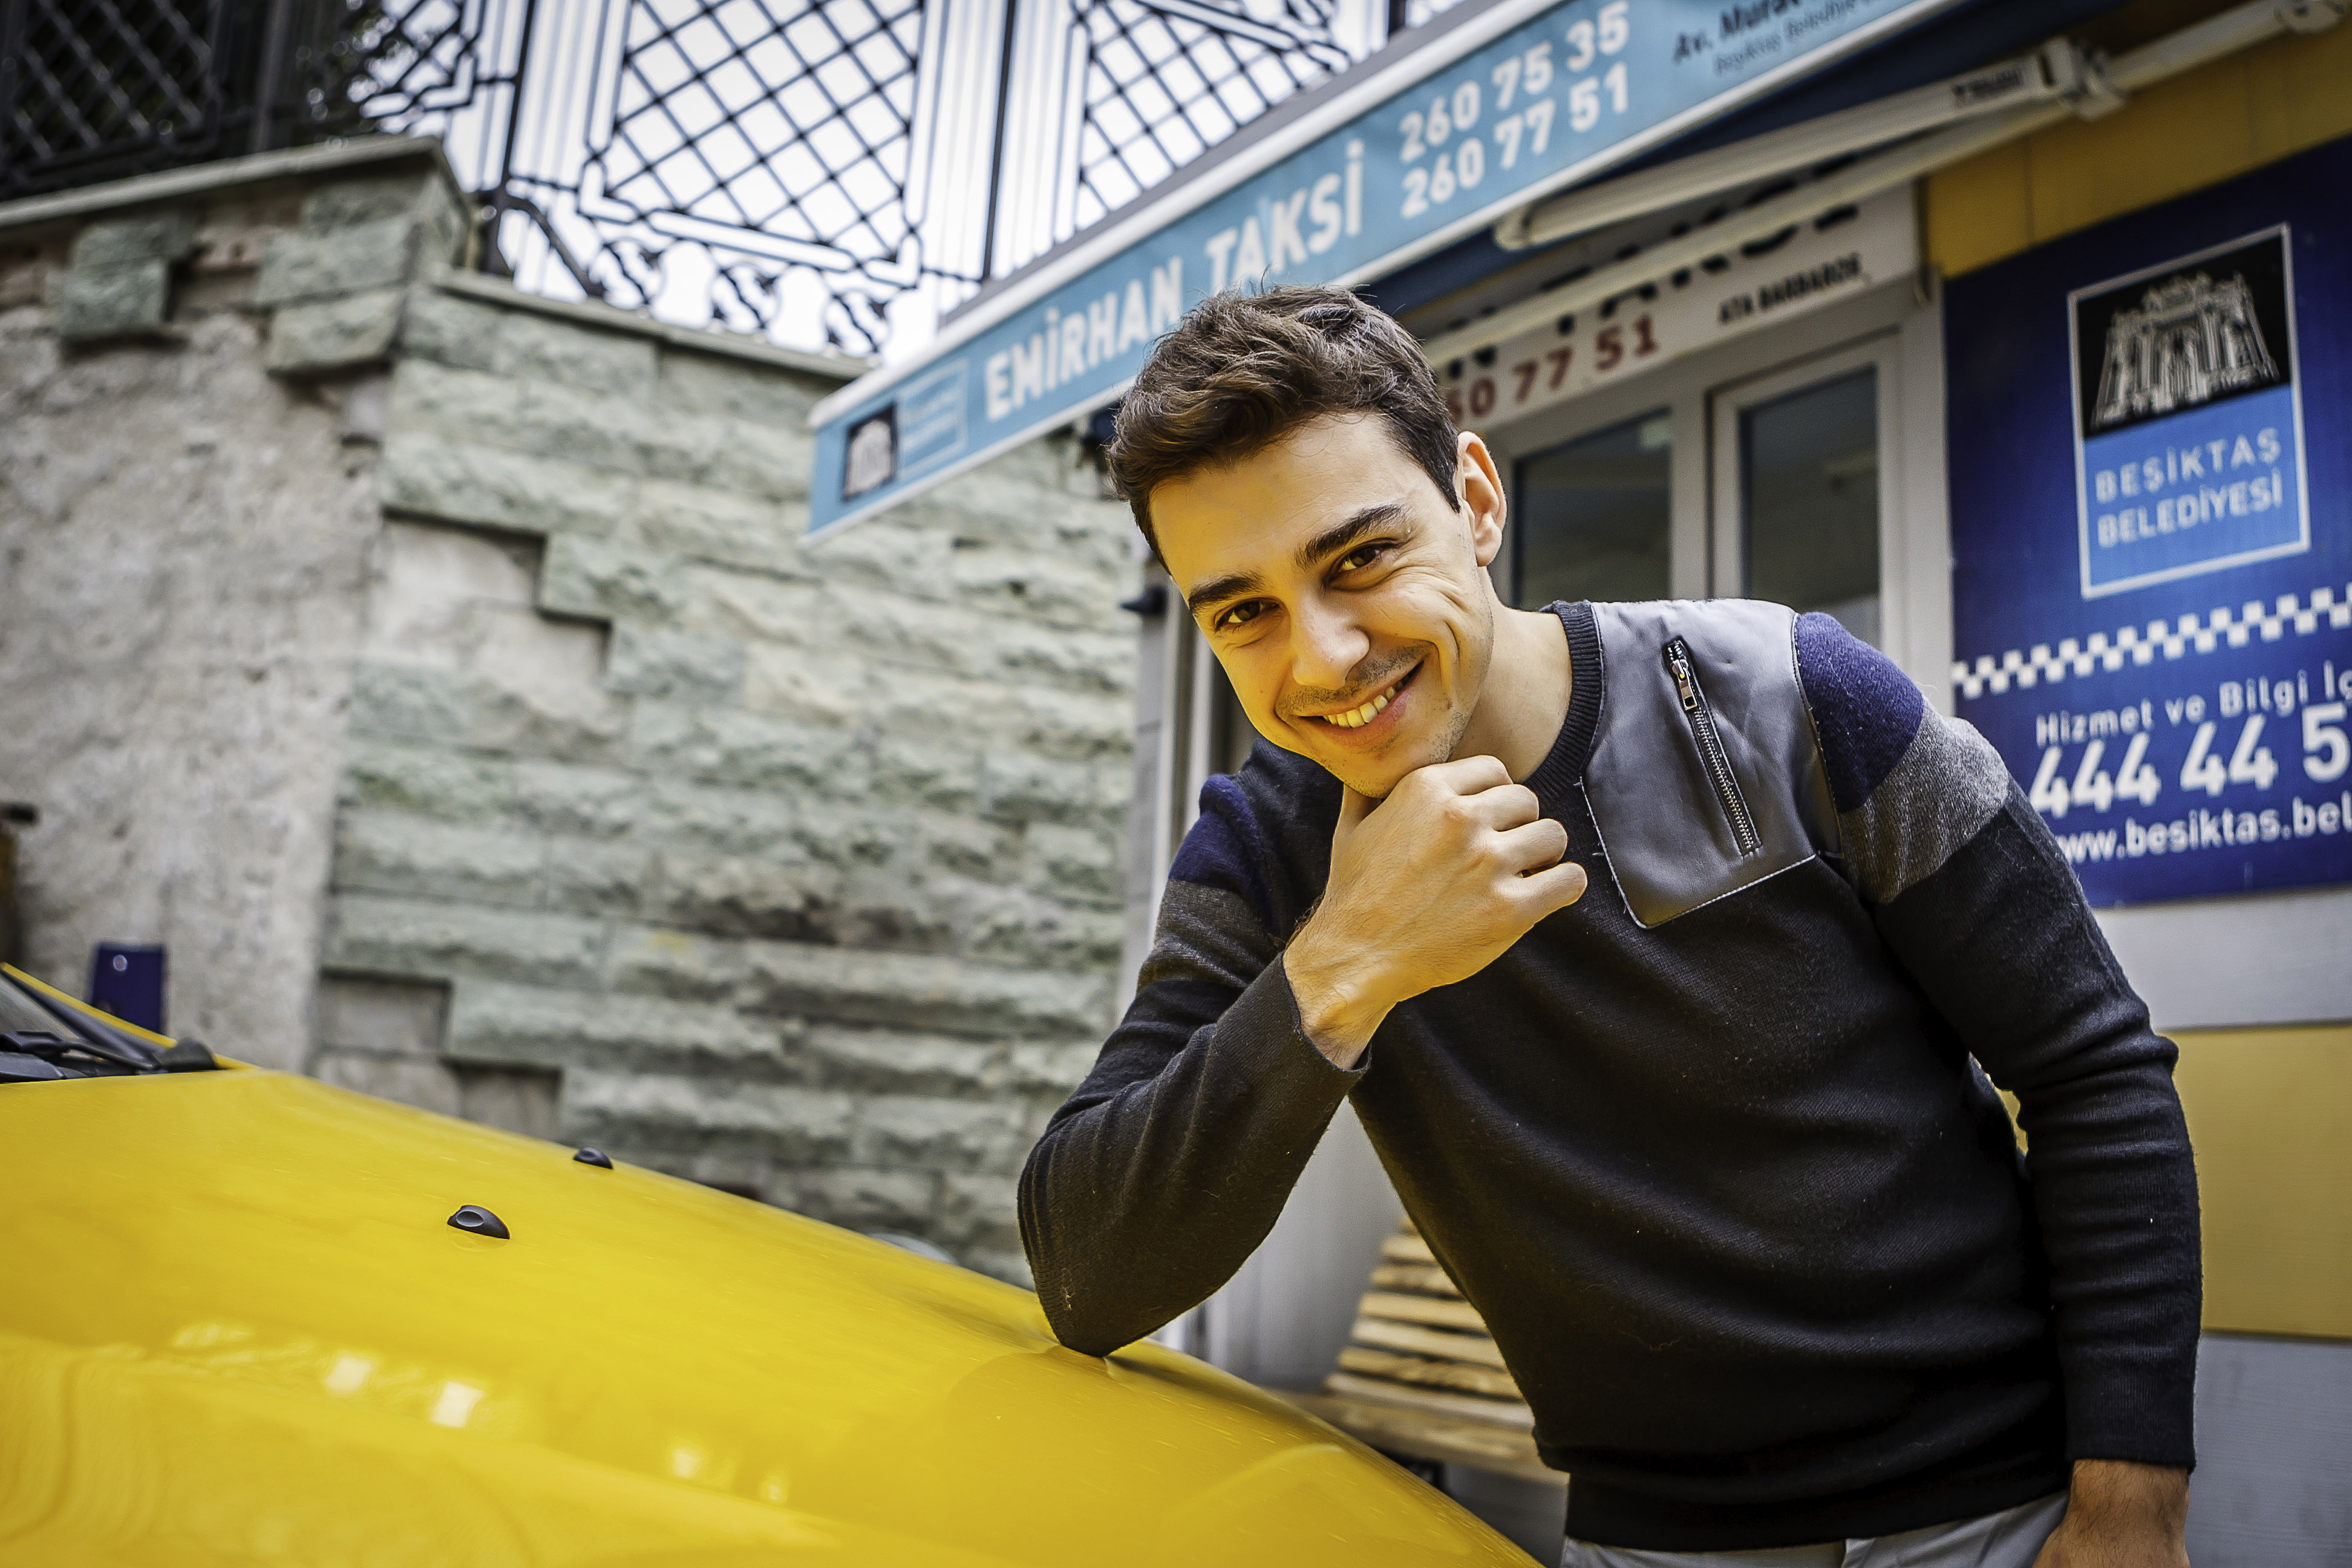 Taksici oyuncu